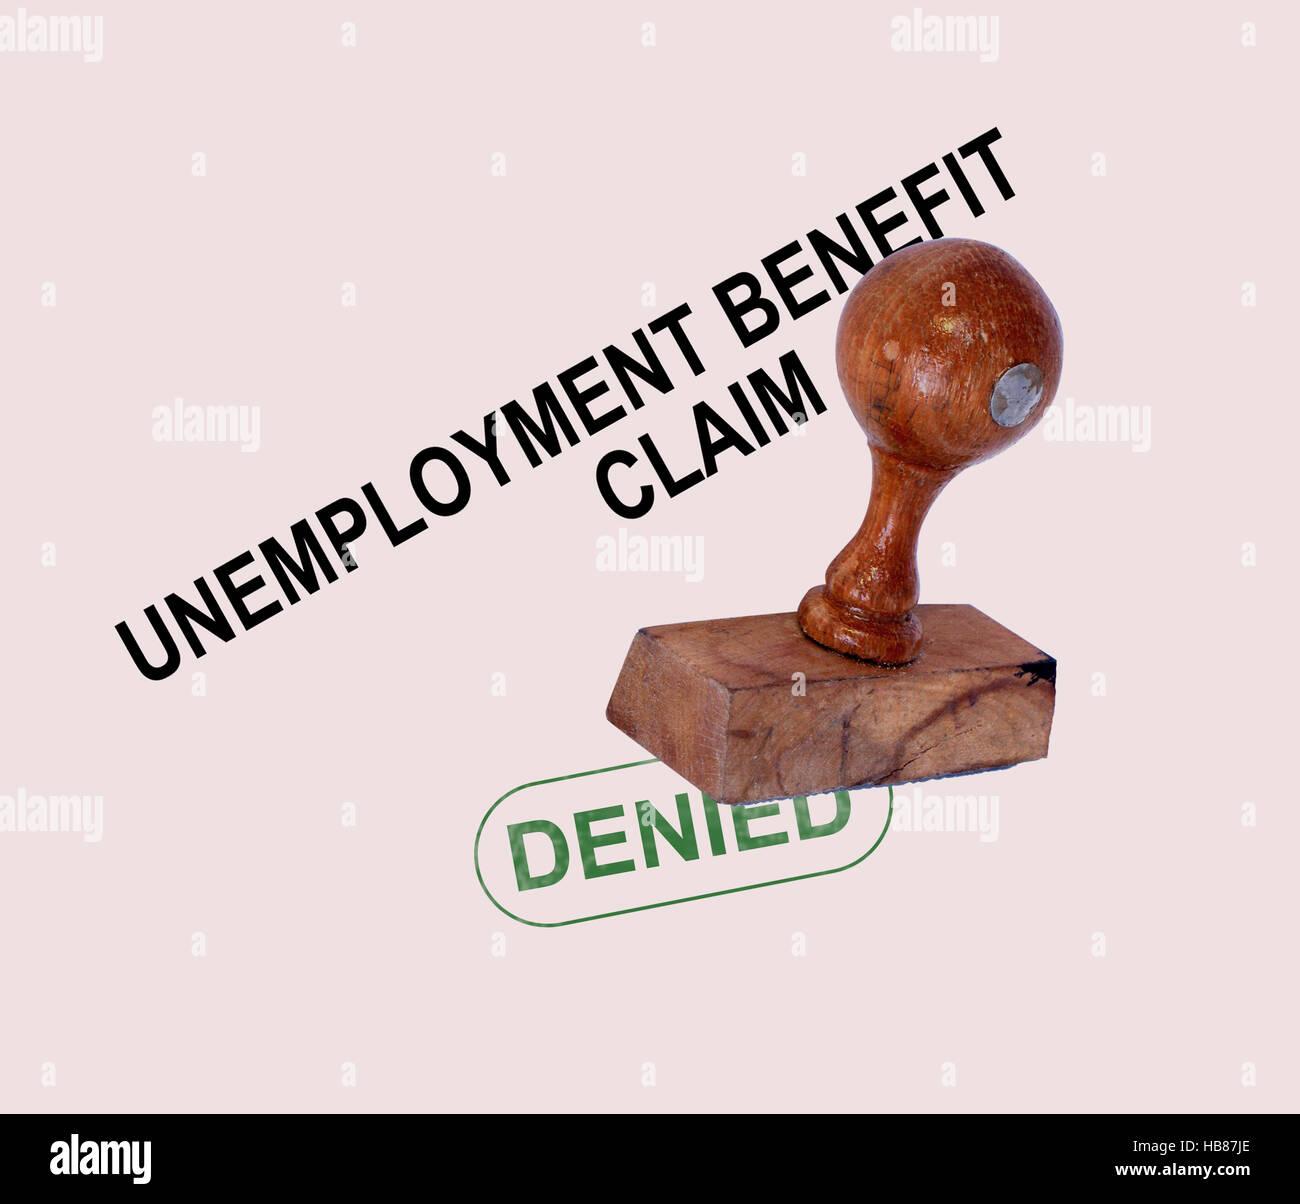 Unemployment Benefit Claim Denied - Stock Image